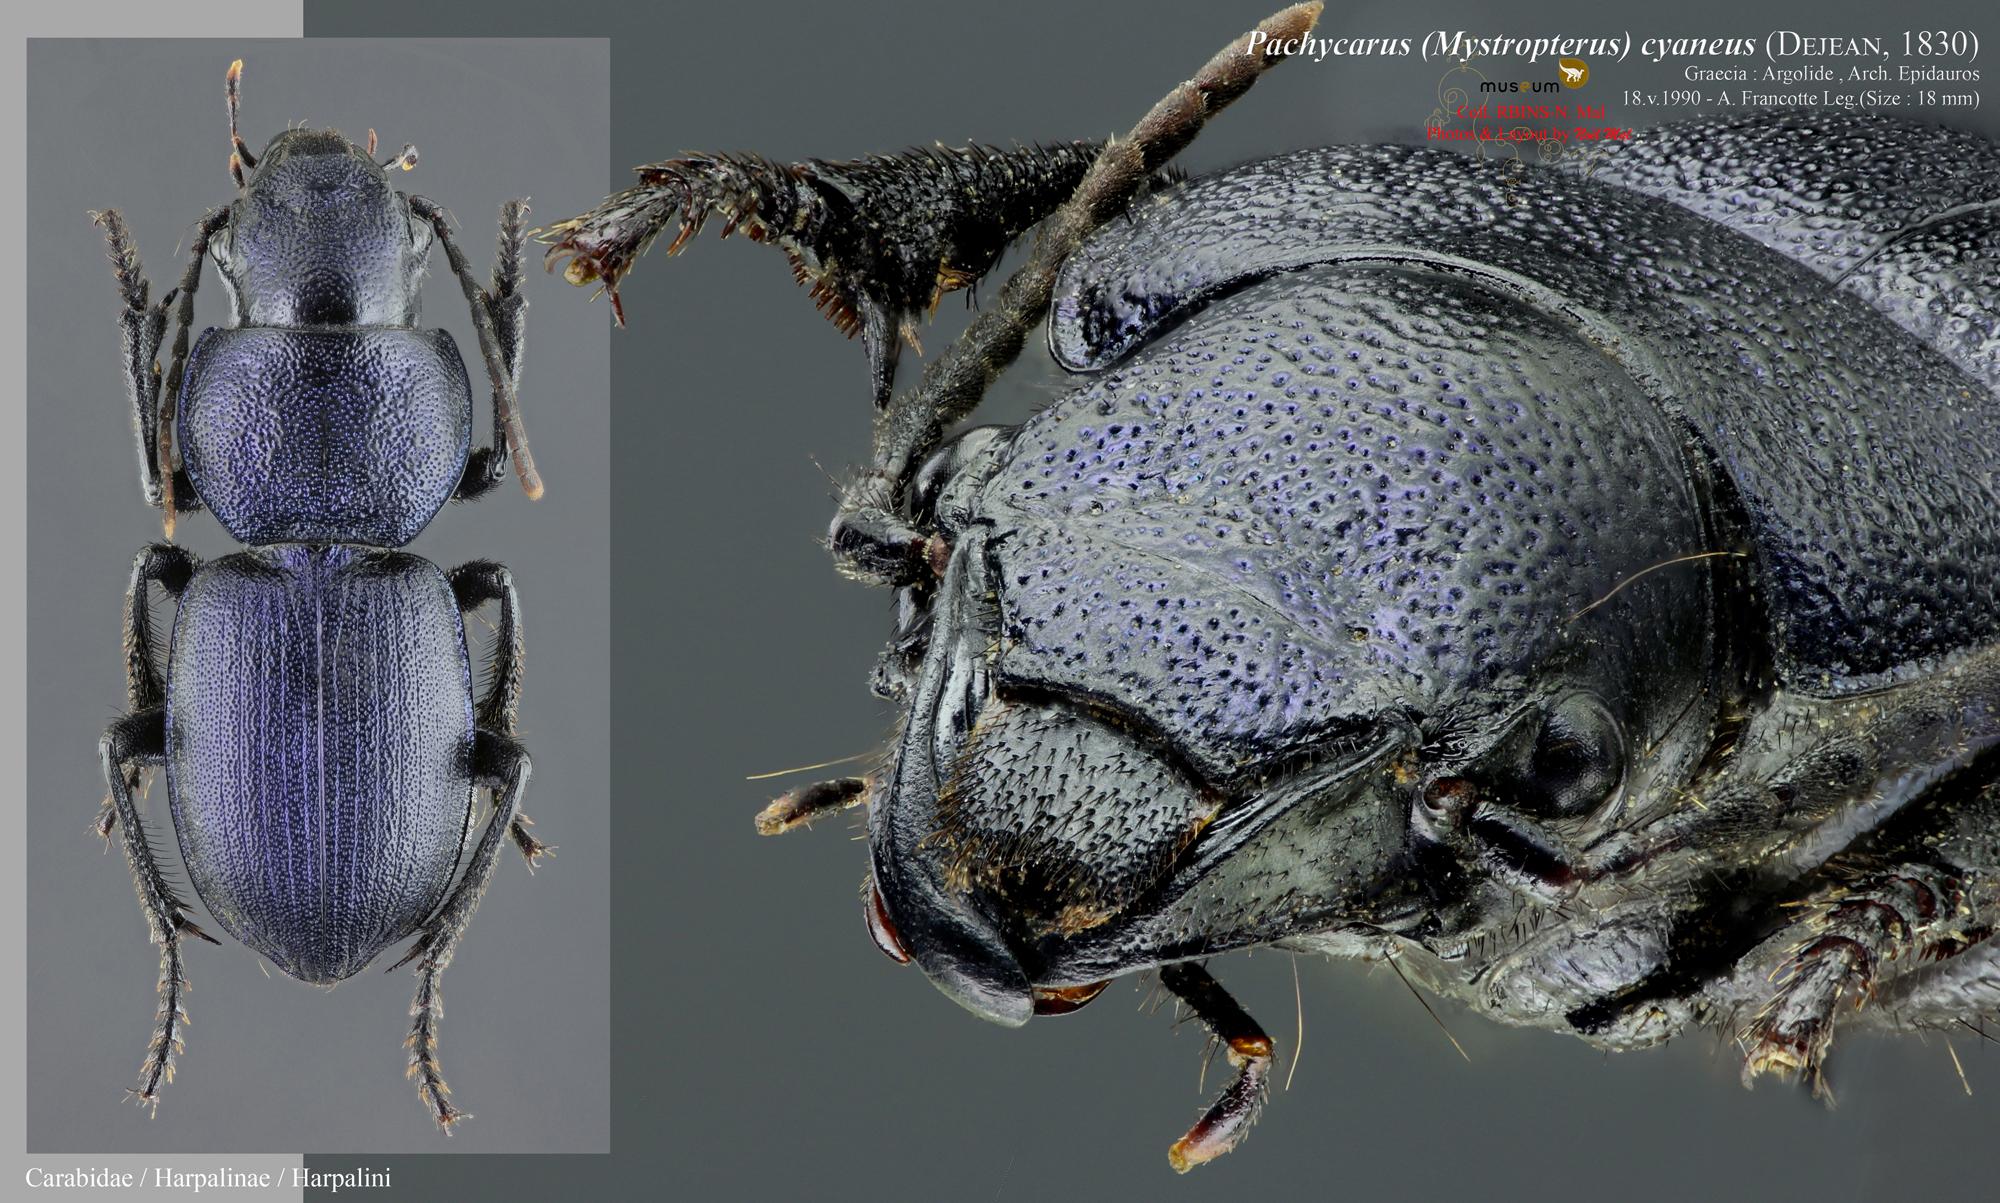 Pachycarus (Mystropterus) cyaneus WWB.jpg